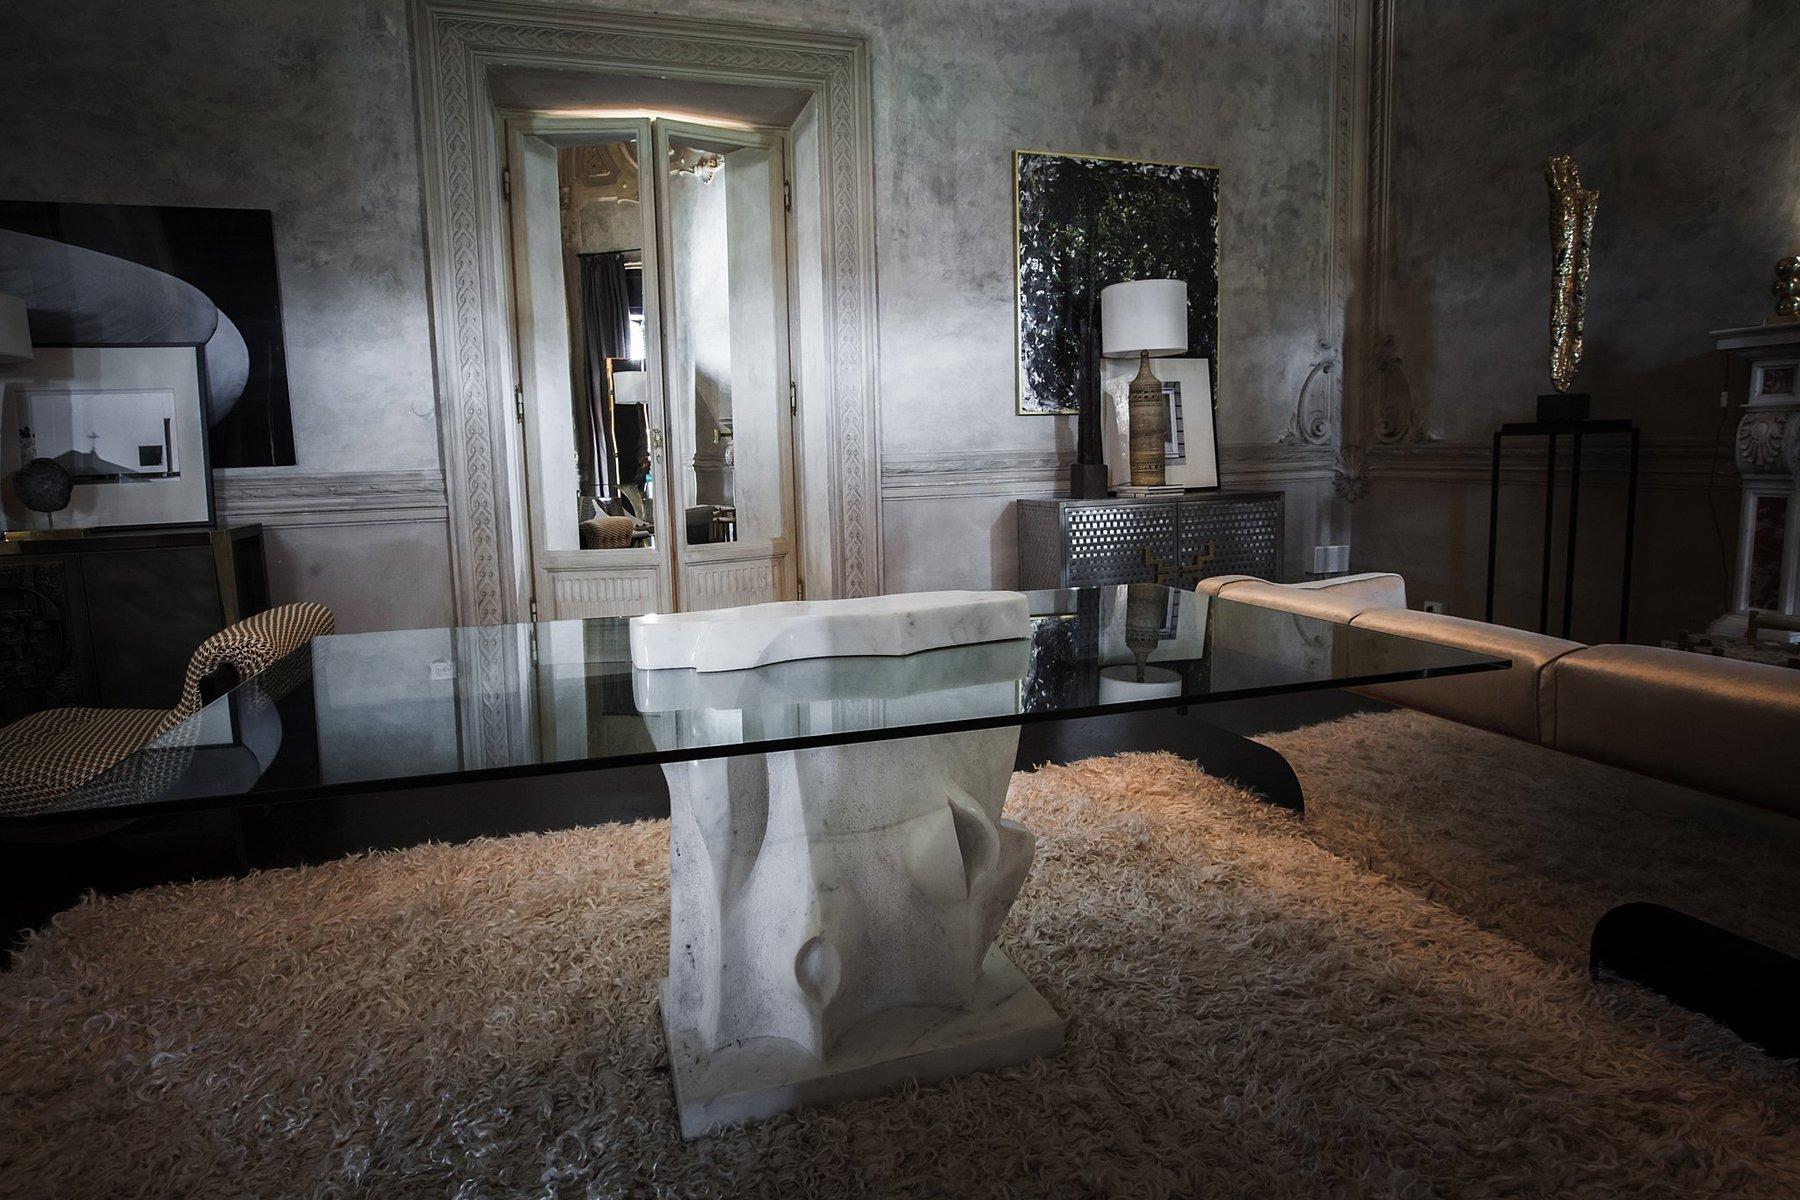 italienischer skulpturaler marmor tisch 1981 bei pamono kaufen. Black Bedroom Furniture Sets. Home Design Ideas